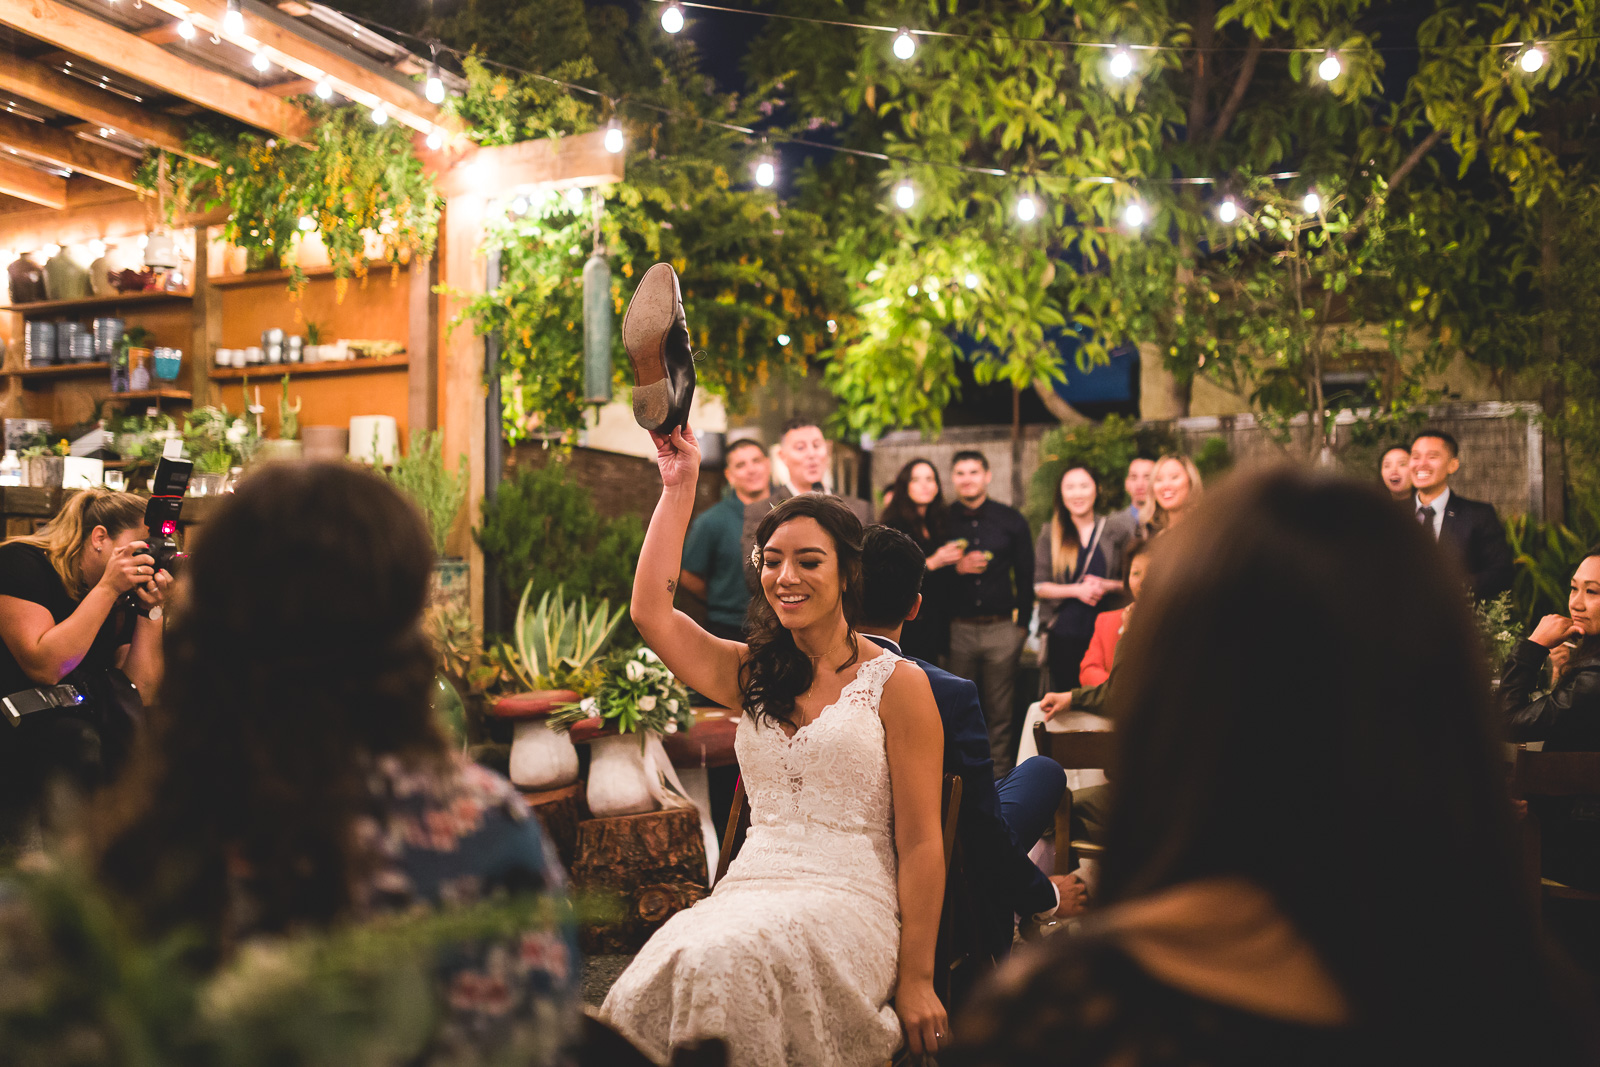 Jeremy-Lizette-Wedding-12.jpg